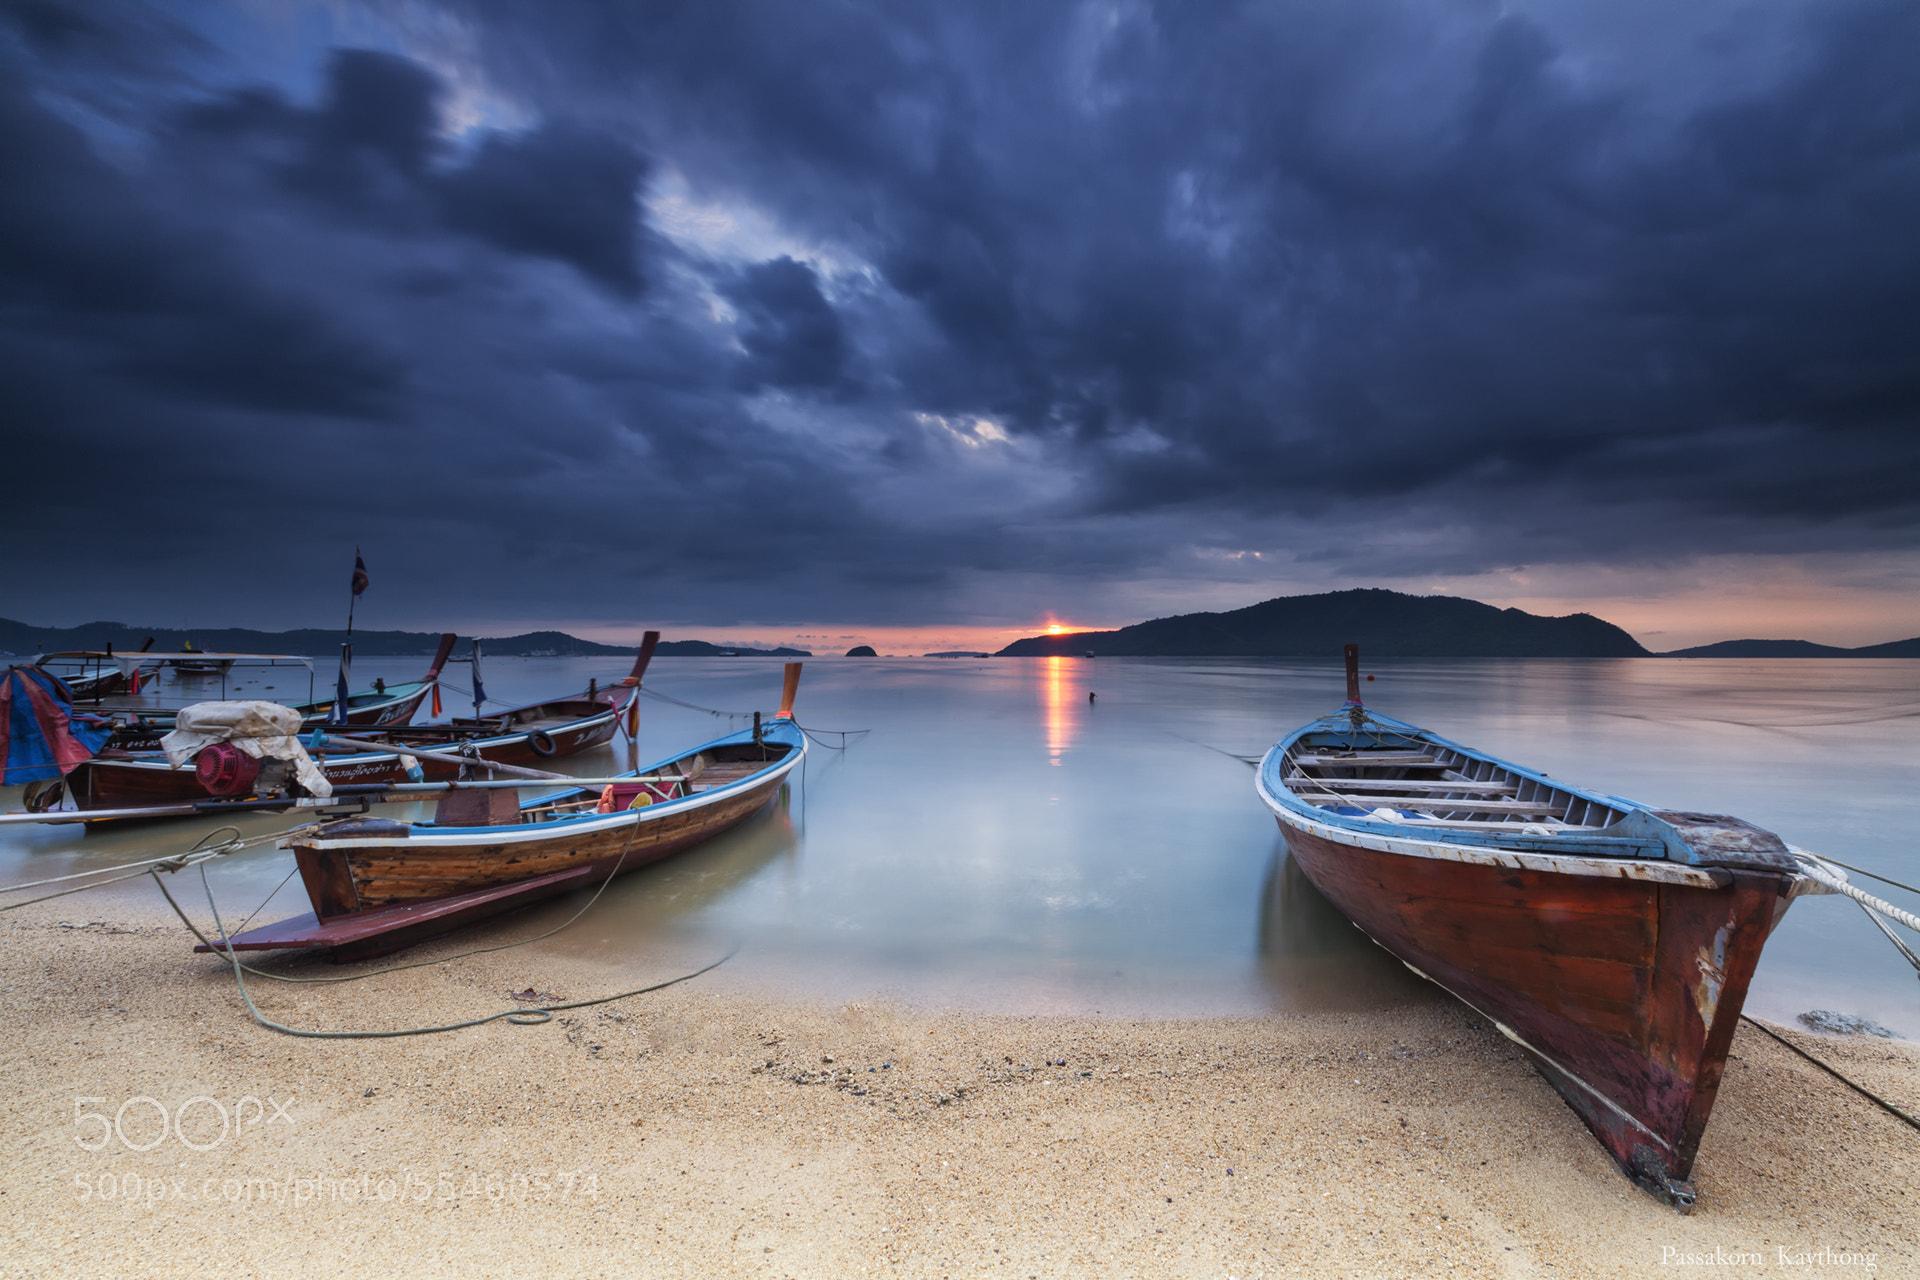 Photograph Morning rain clouds. by Wazabi Bomb Bomb on 500px